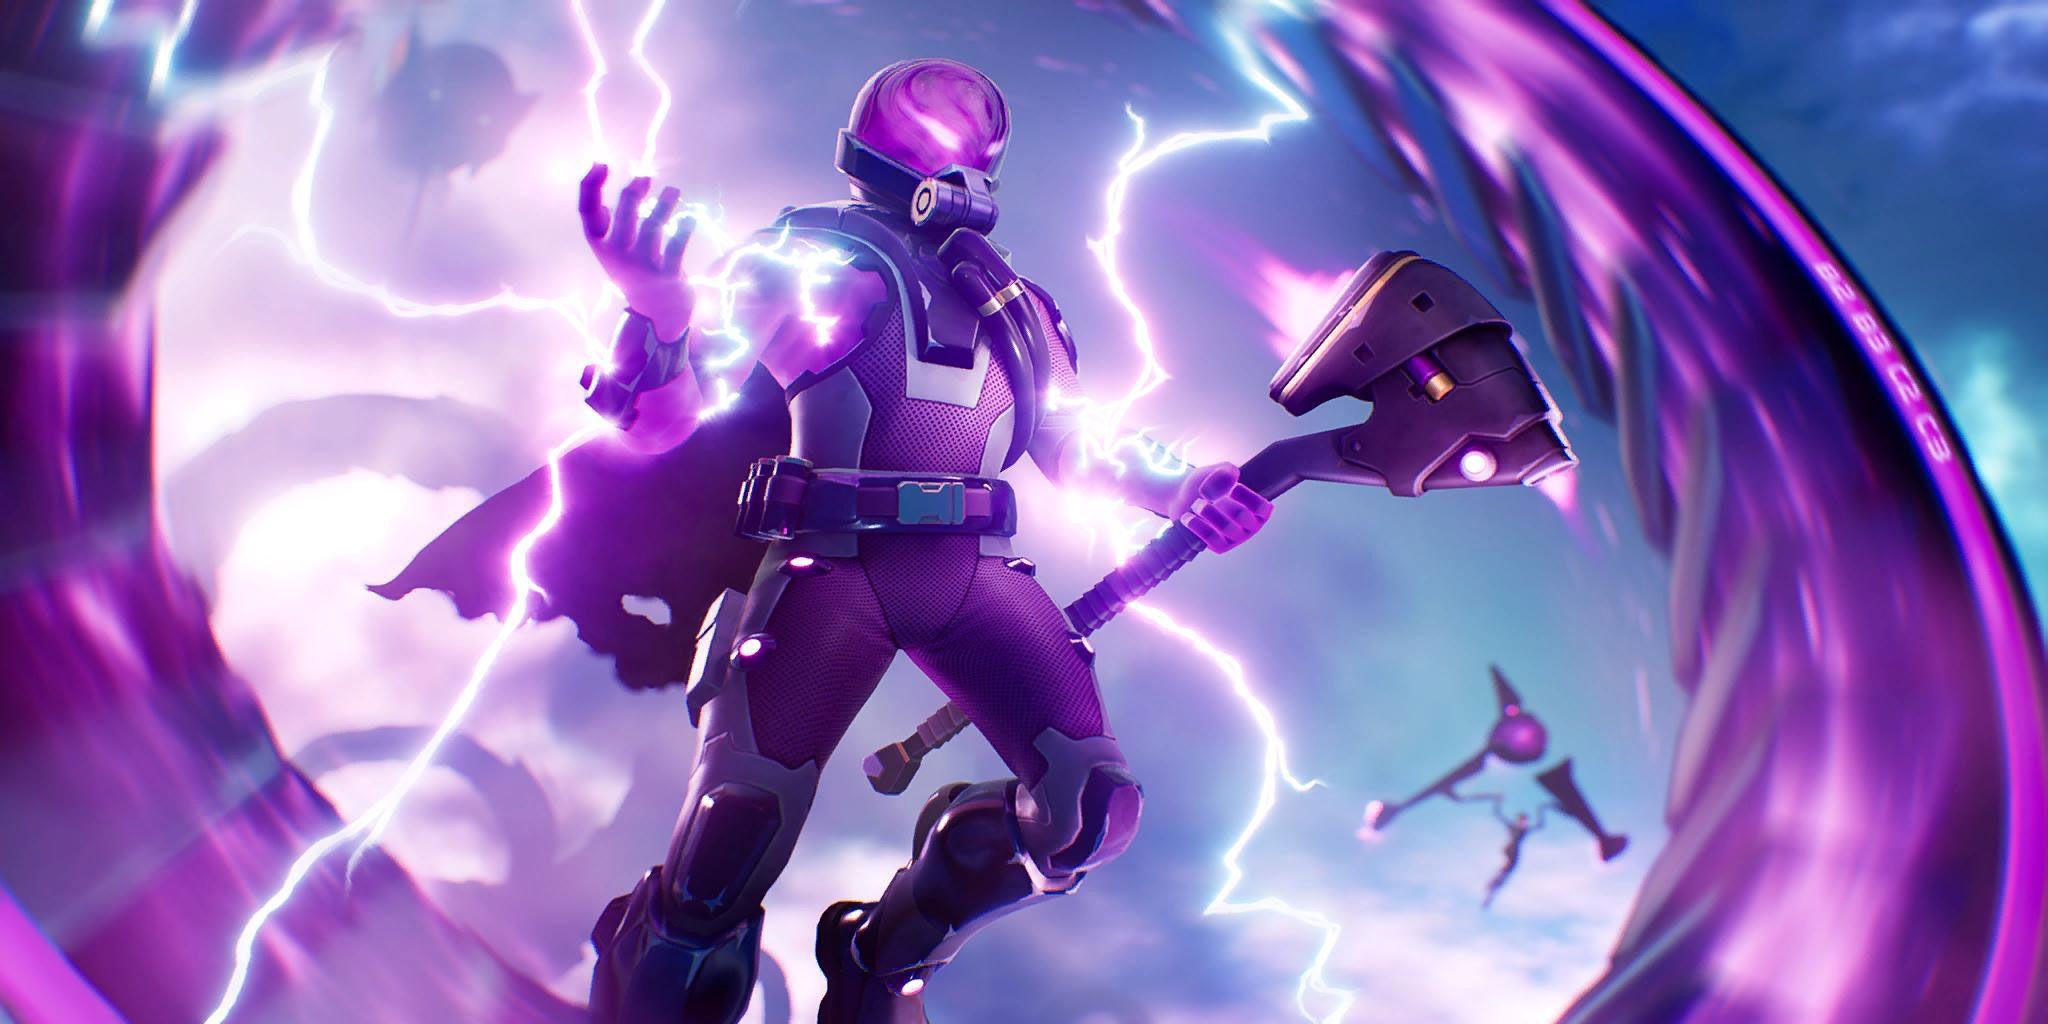 Fortnite Loading Screen Wallpaper HD Fortnite, Battle